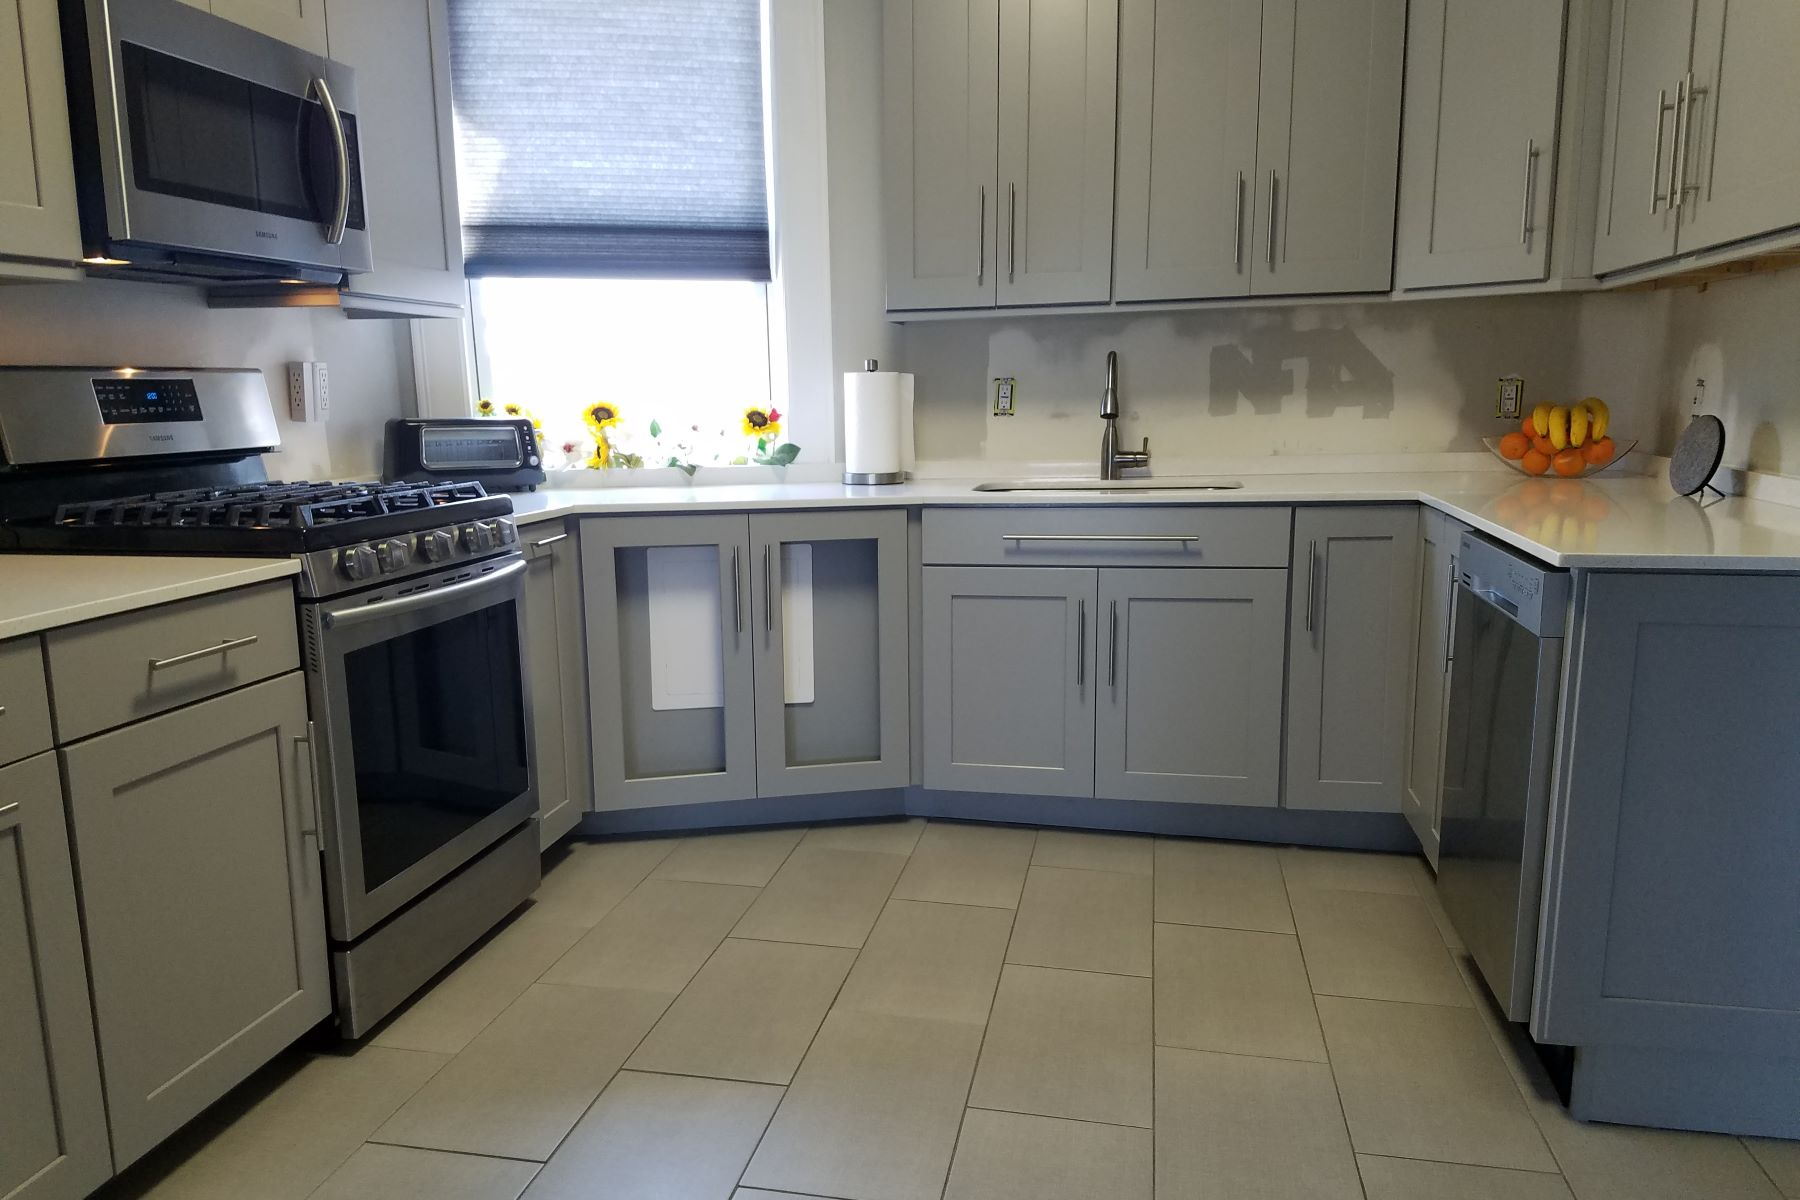 شقة بعمارة للـ Sale في Fantastic renovation on this spacious two bedroom 8508 Kennedy BLVD #D2 North Bergen, New Jersey, 07047 United States